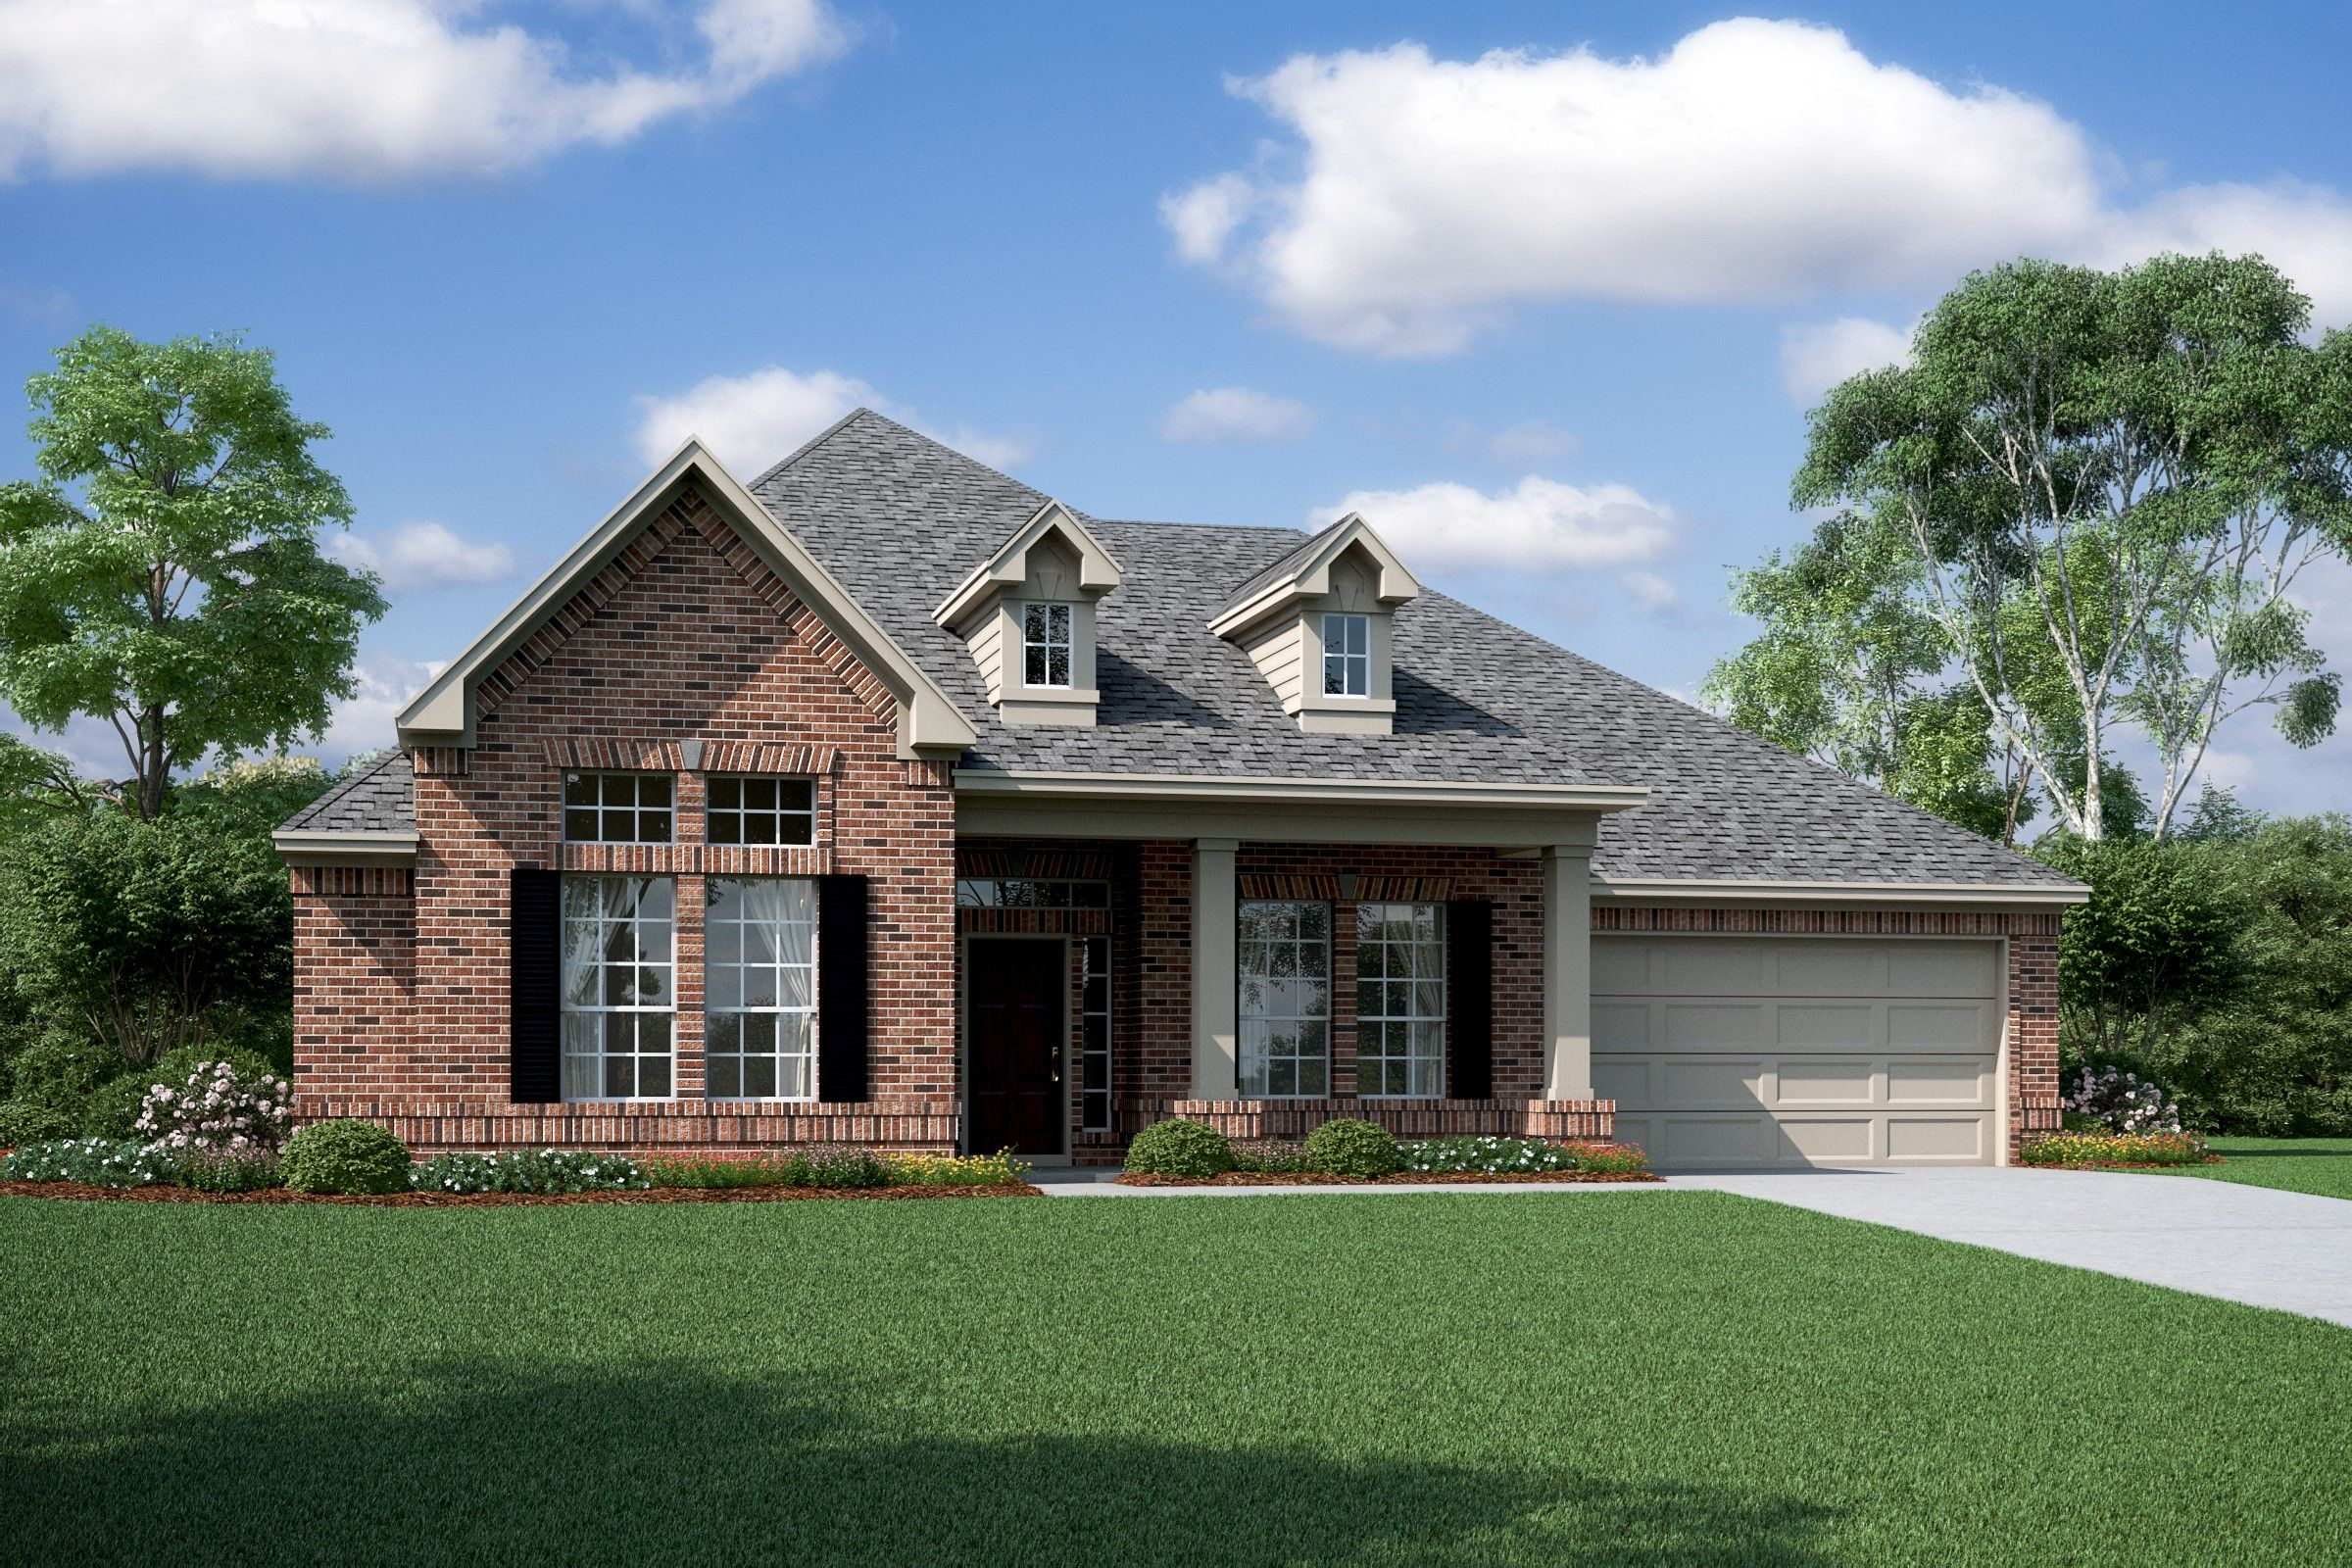 Single Family for Sale at Thunder Bay - Raymond Mccollum Park Rd & Thunder Bay Beach City, Texas 77523 United States